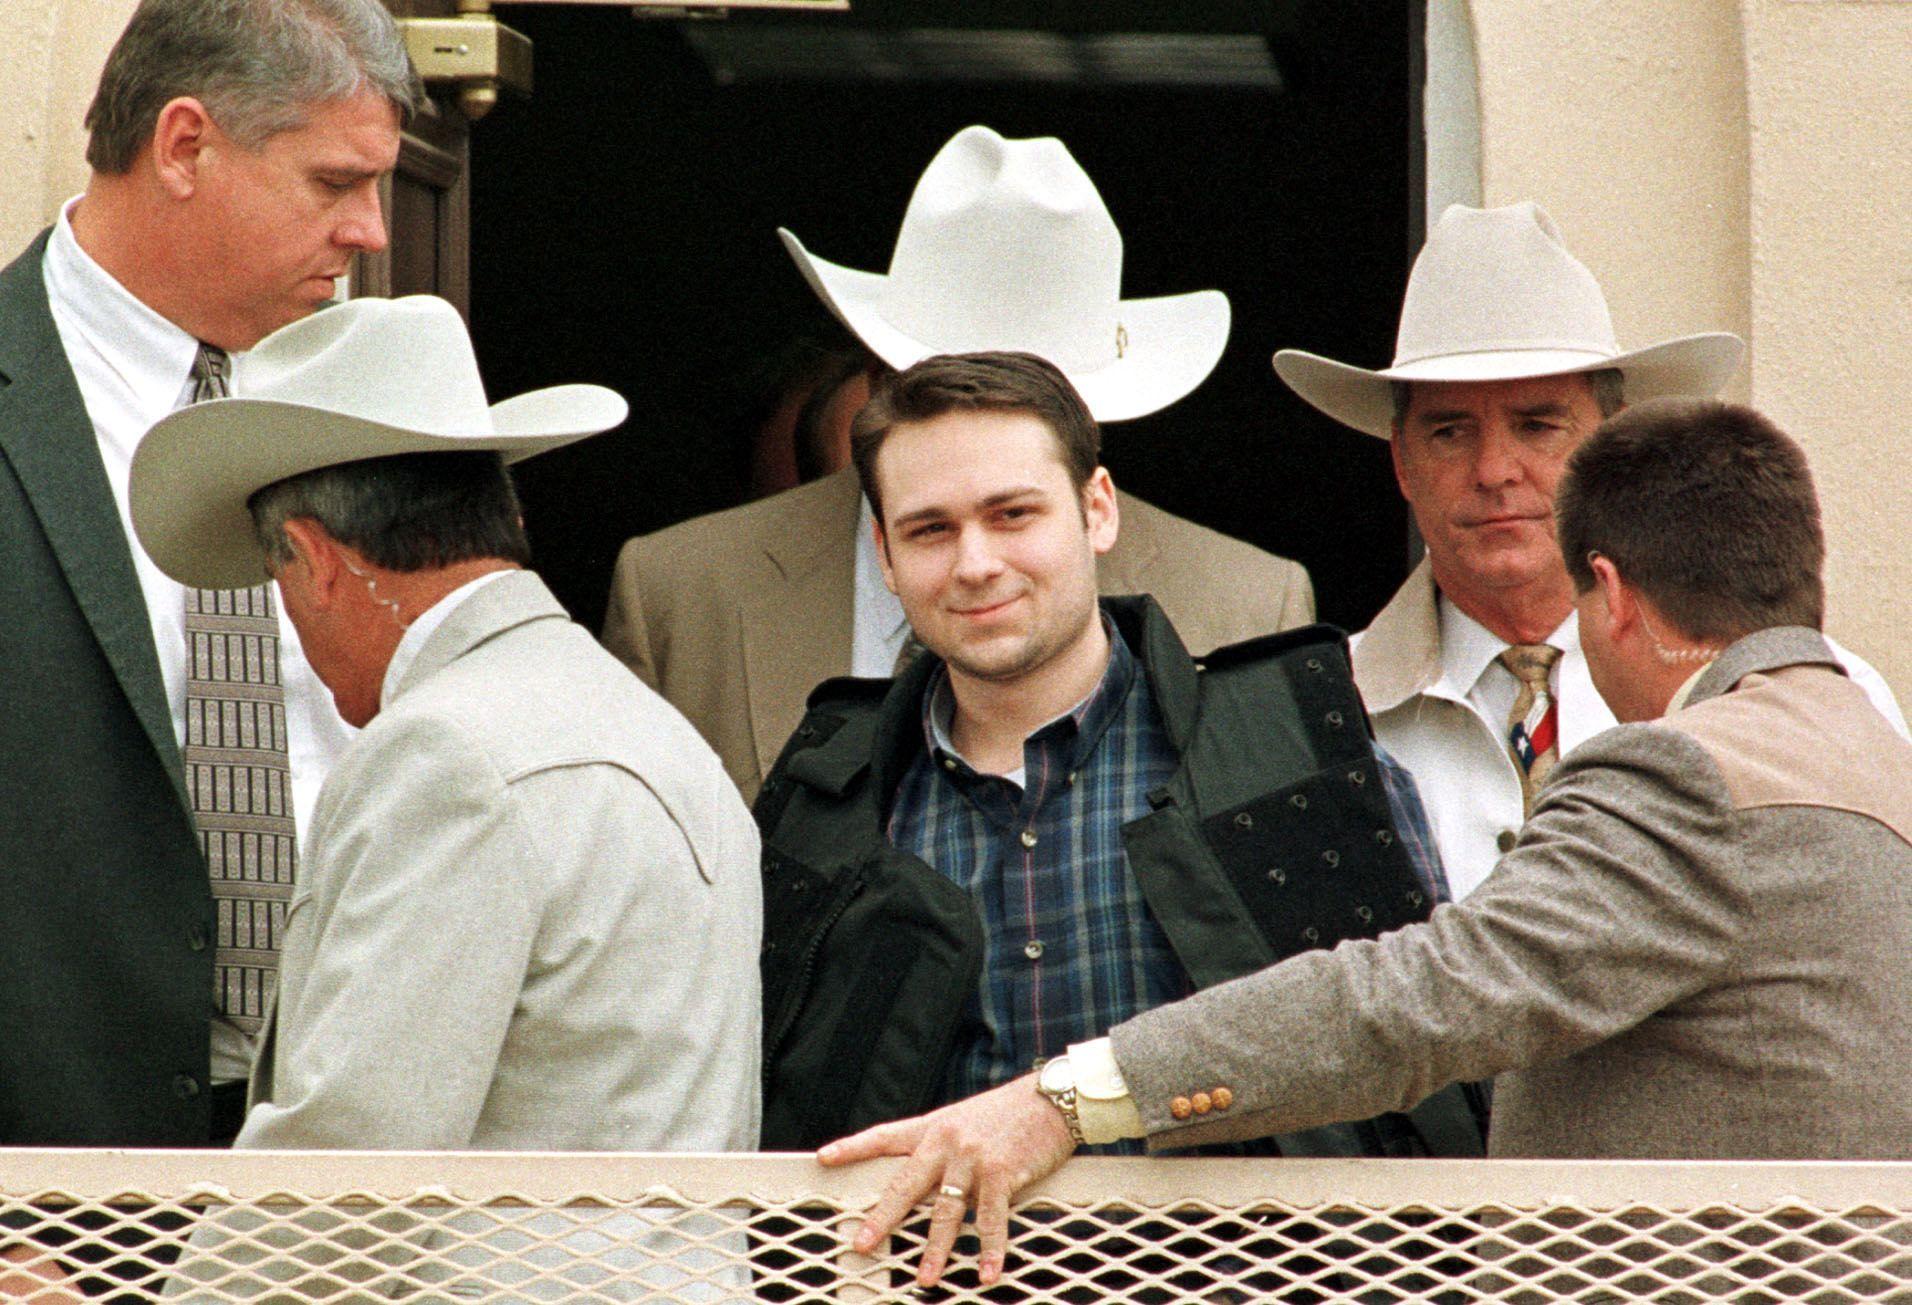 John William King execution Texas death row